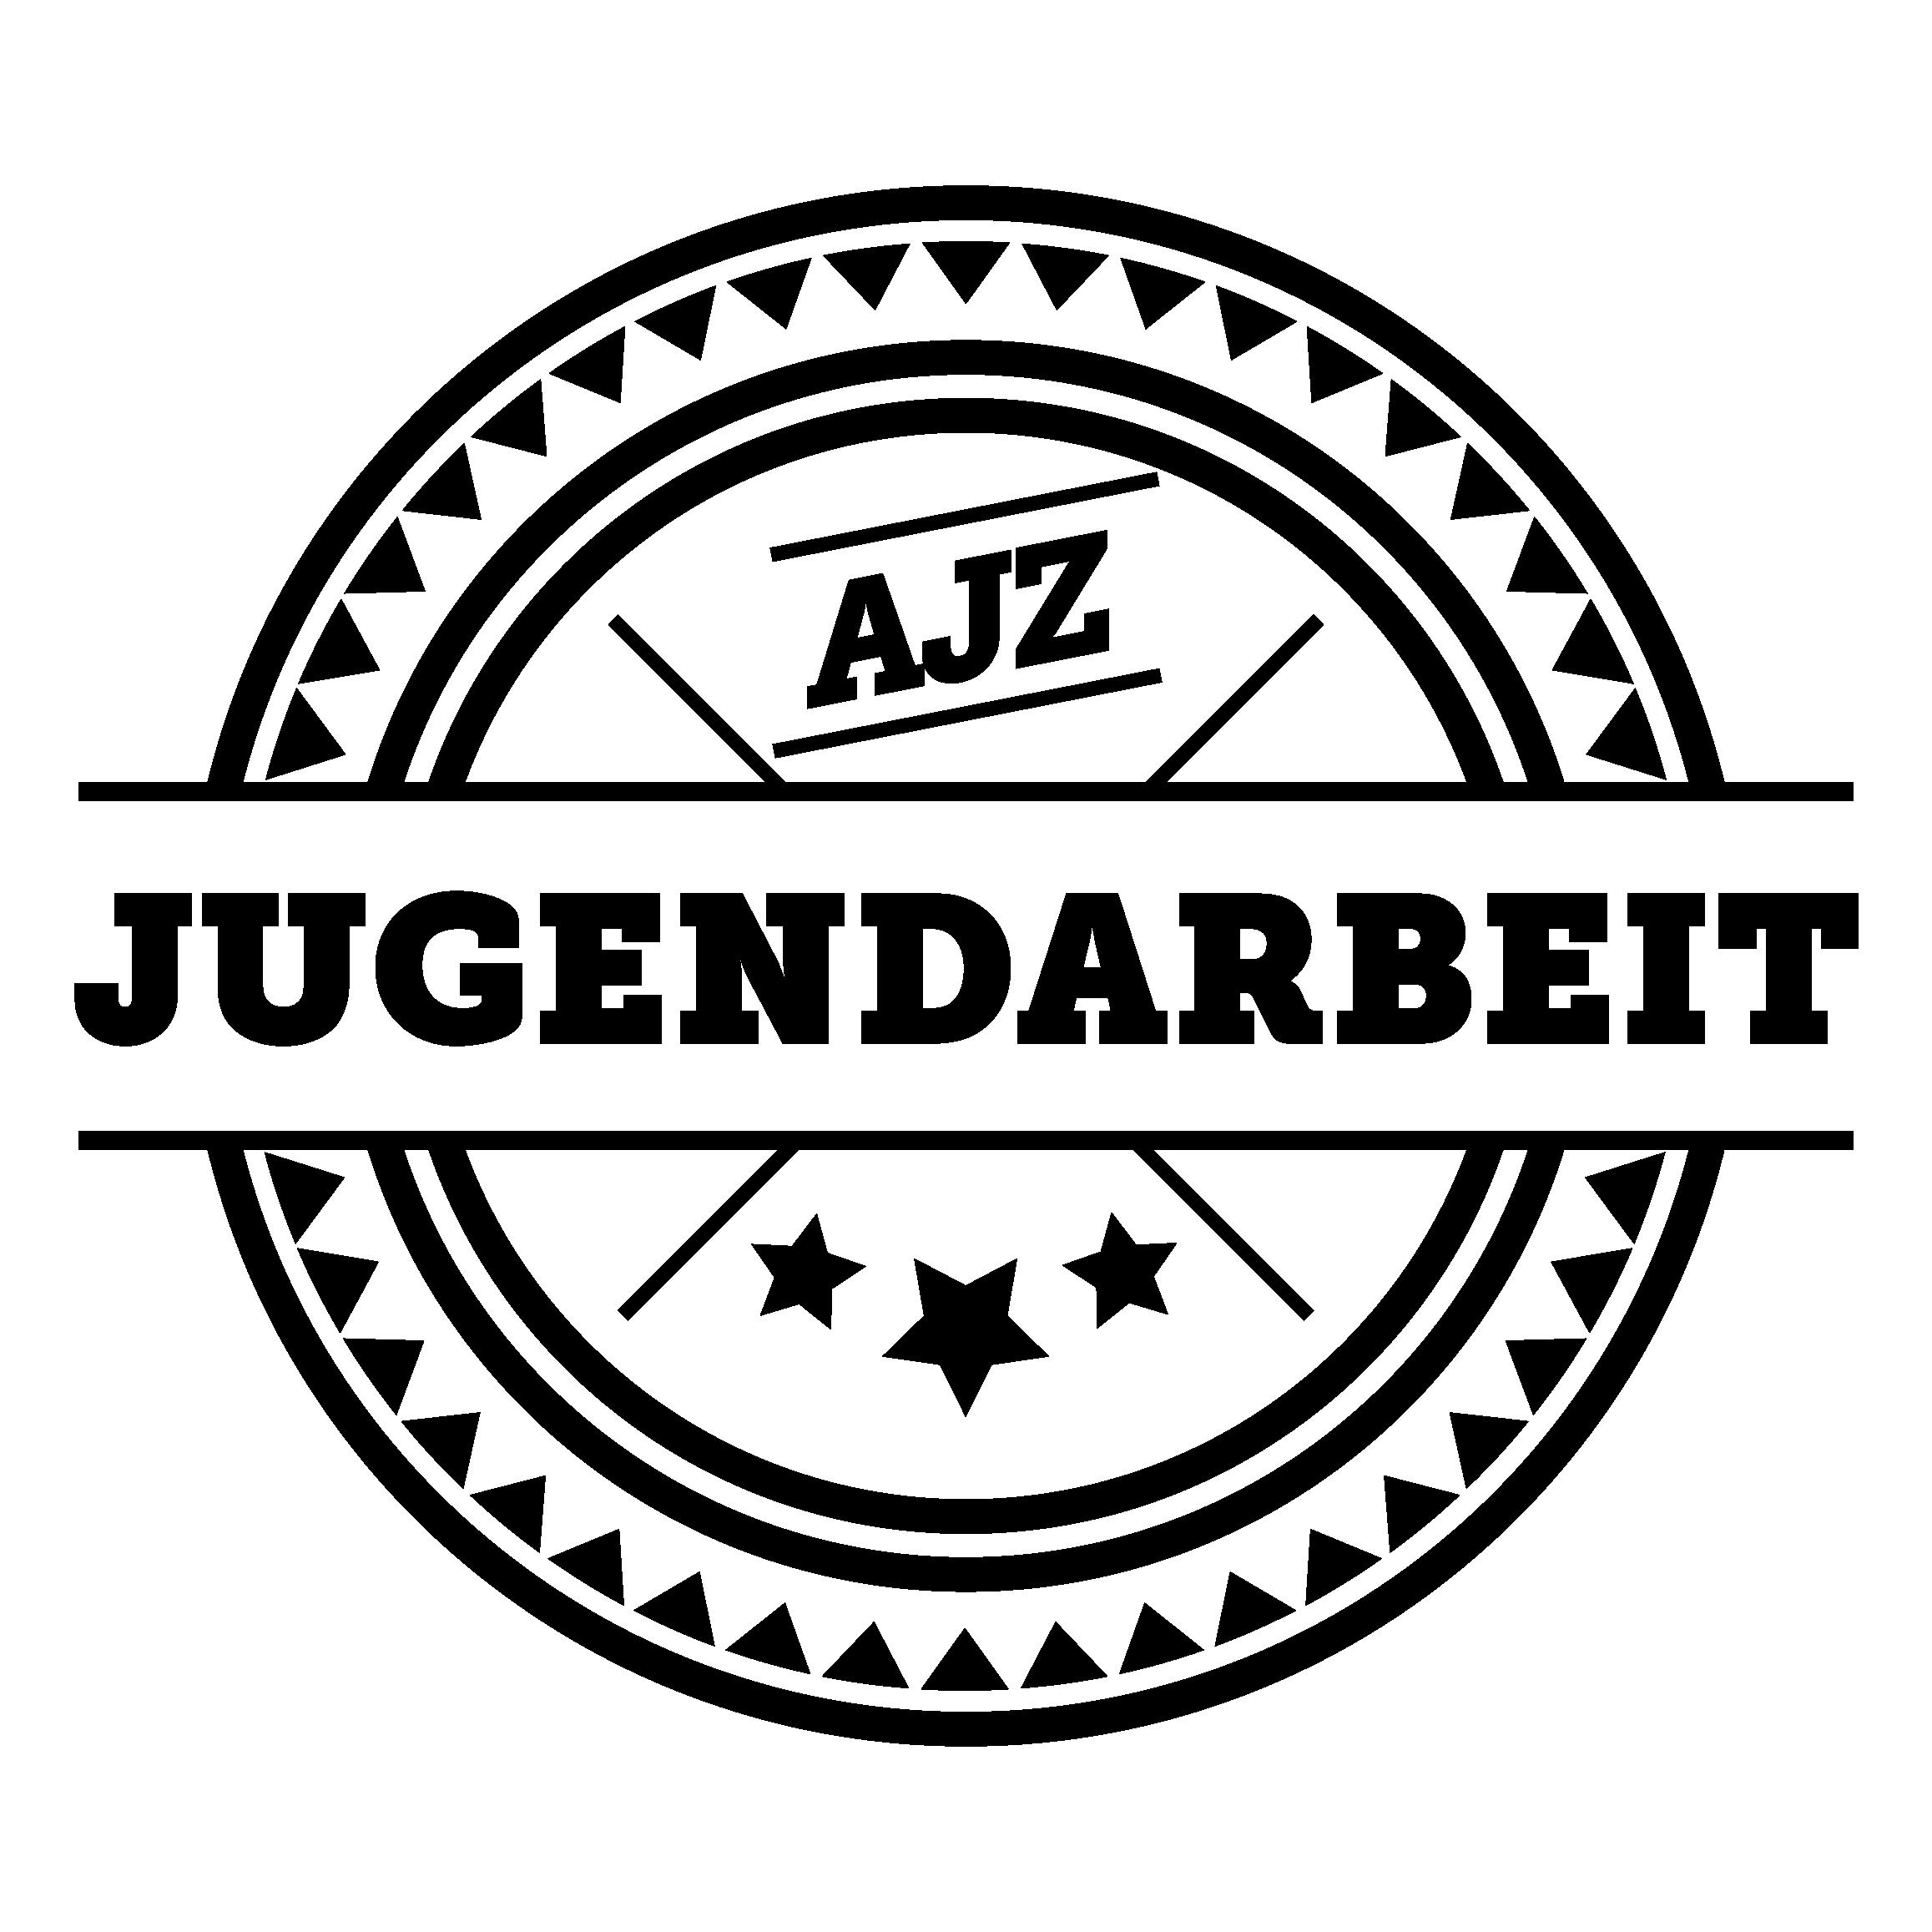 logo-ajz-jugendarbeit